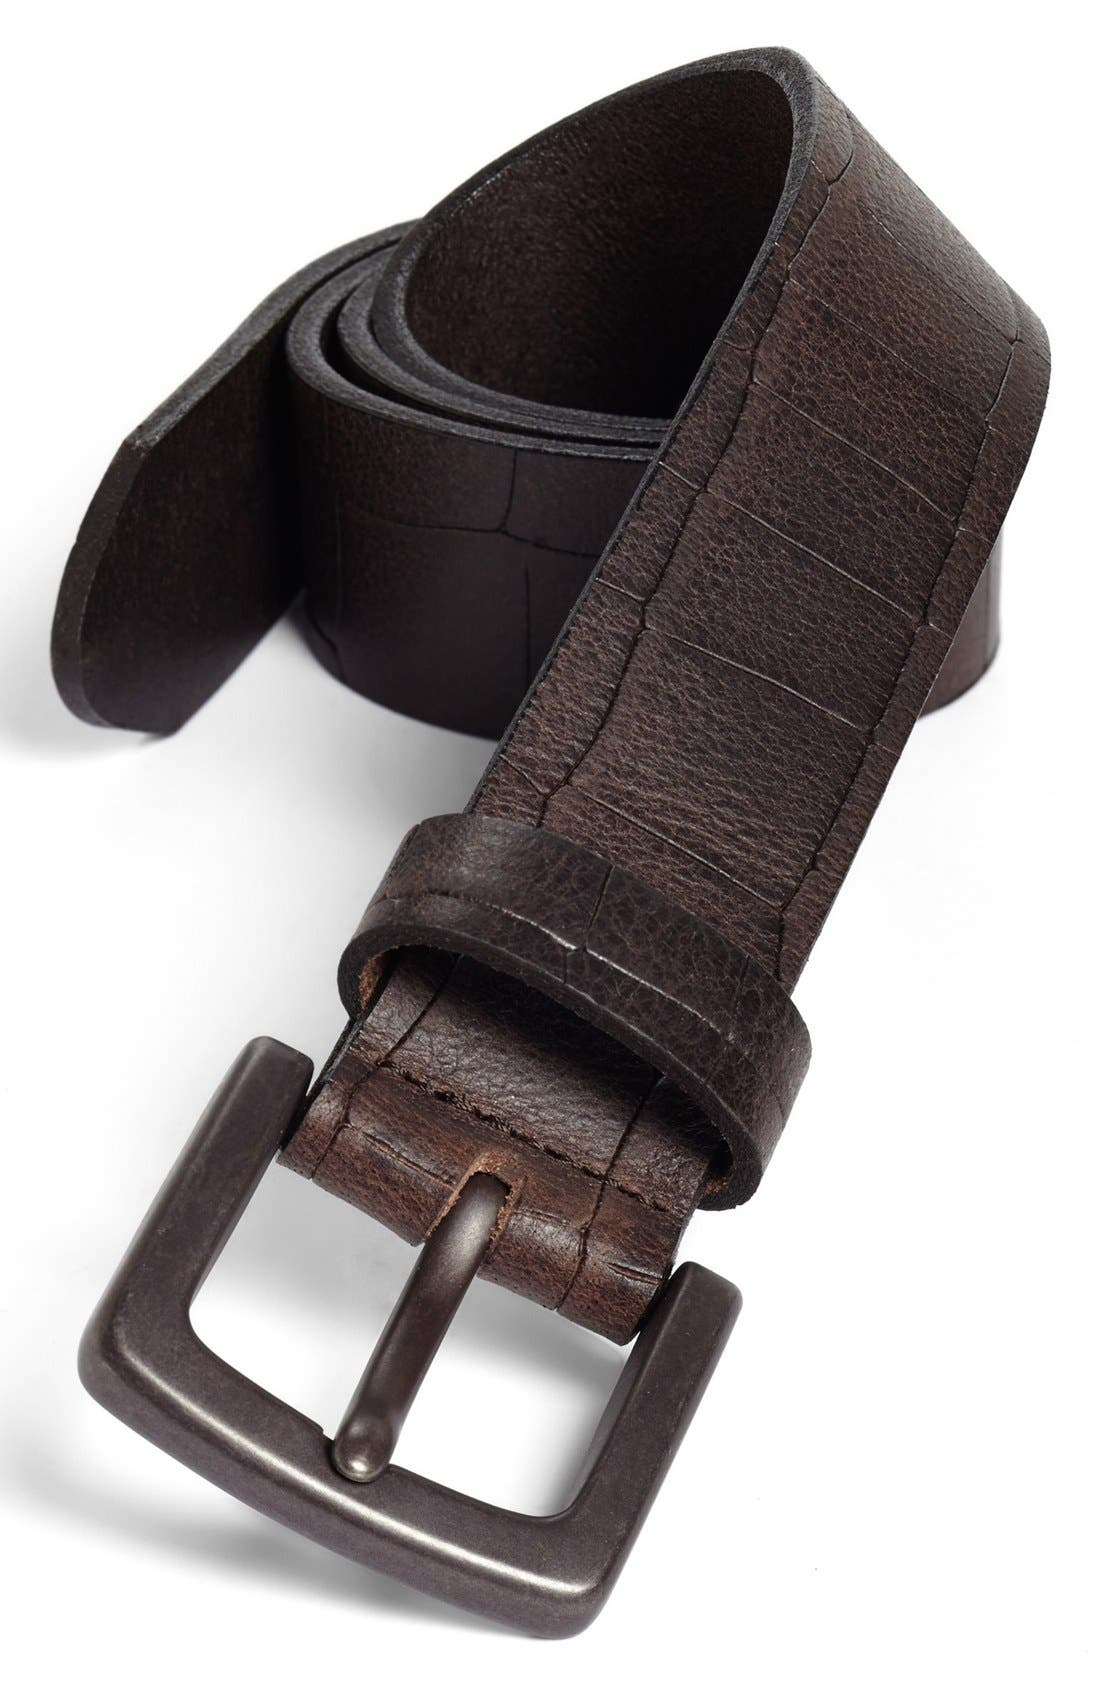 Main Image - Bosca Gator Embossed Belt